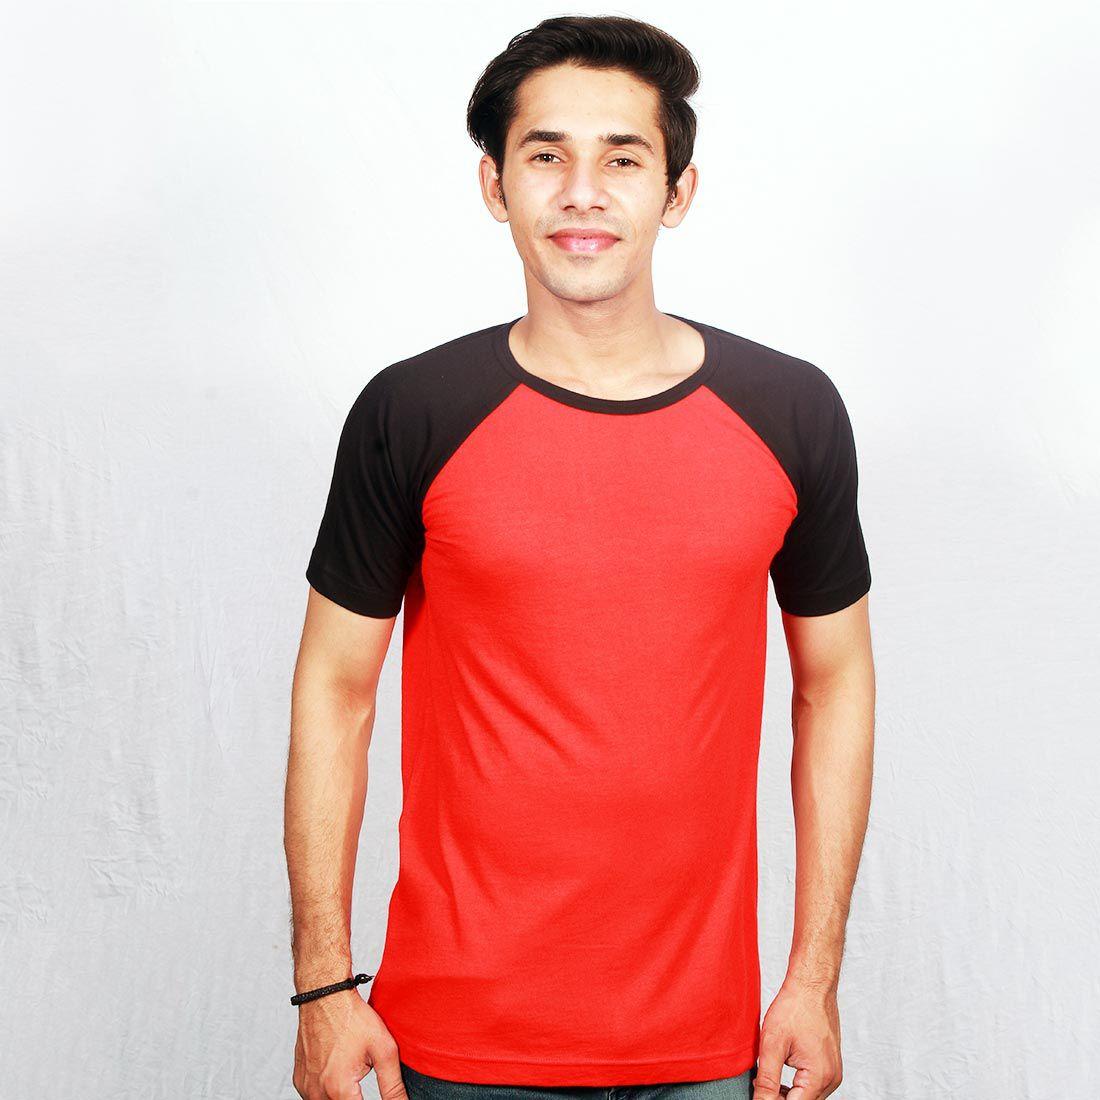 Hollane Fashion Ware Multi Round T-Shirt